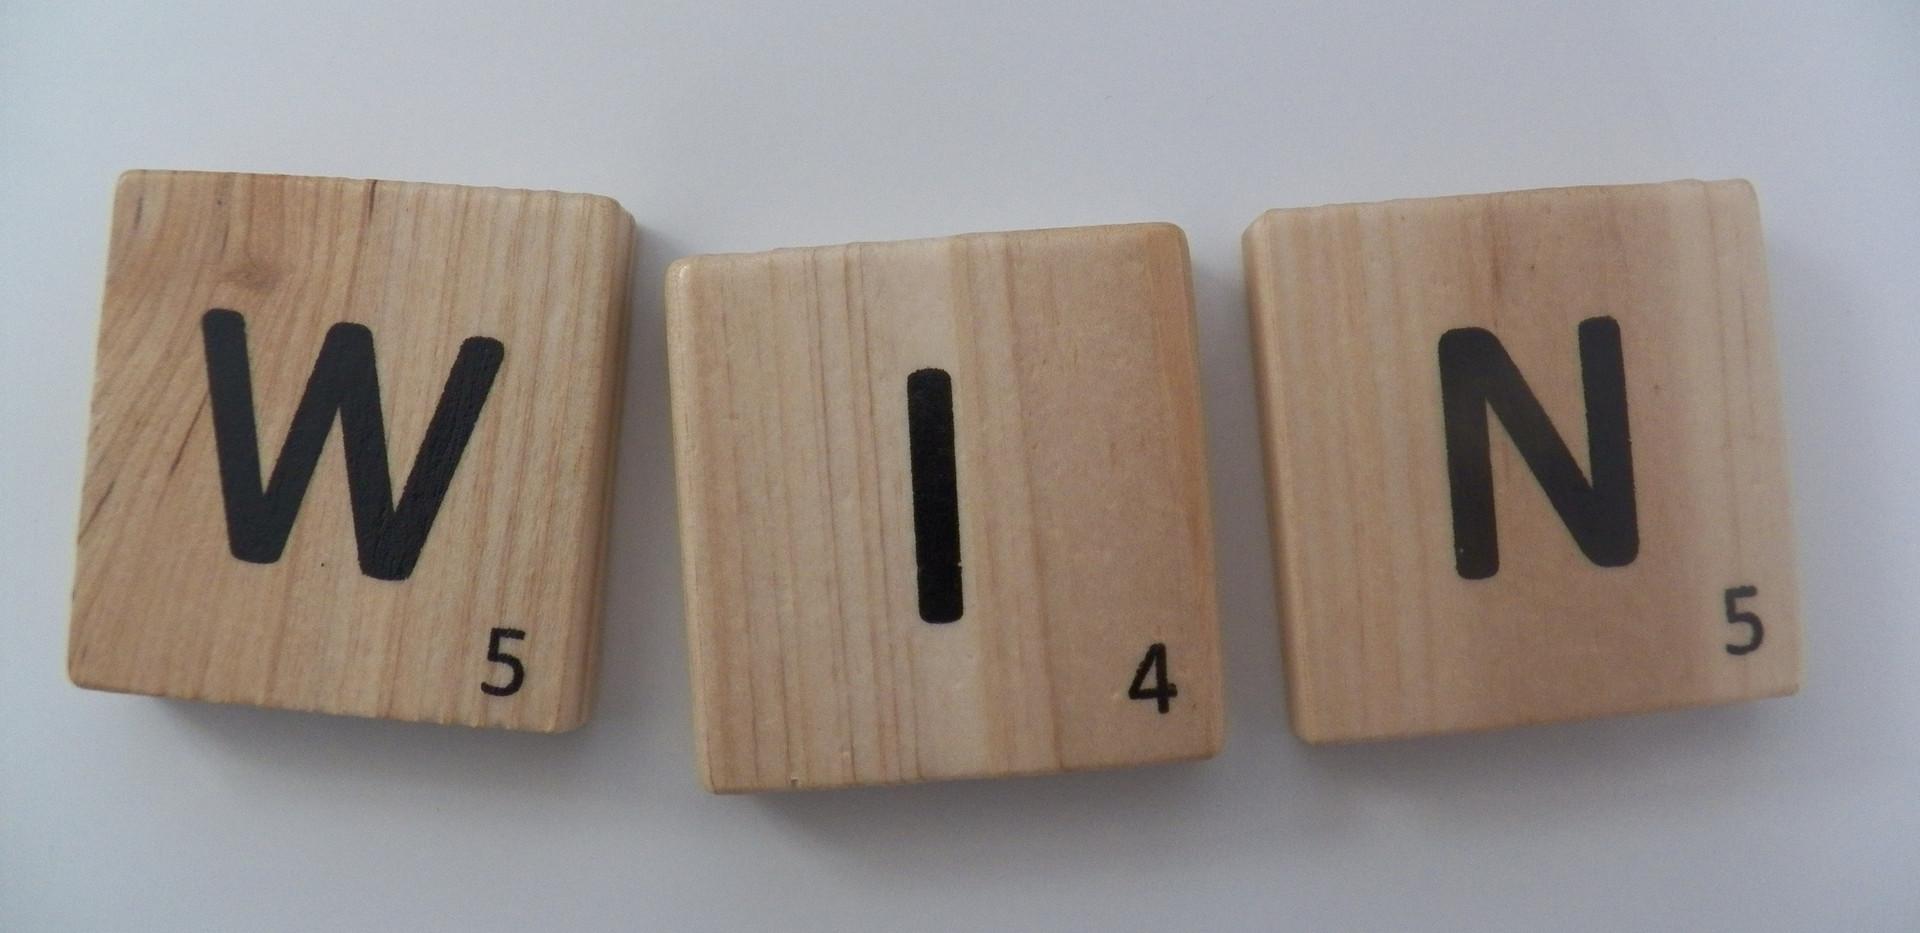 win-letters-word-text-scrabble-372770.jp